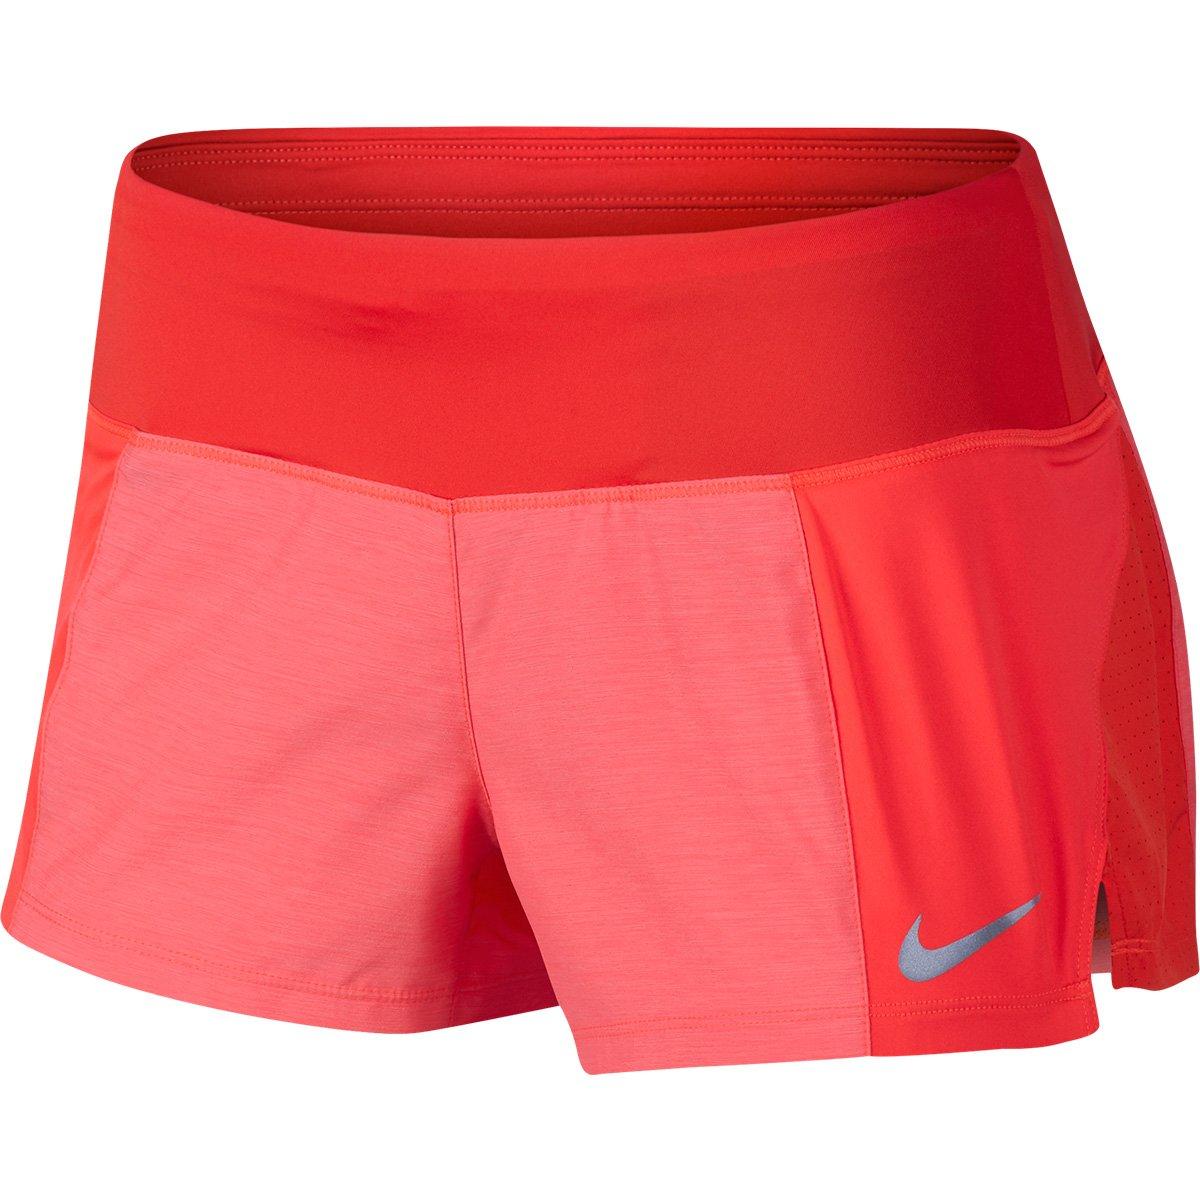 Short Nike Crew 2 Feminino Vermelho